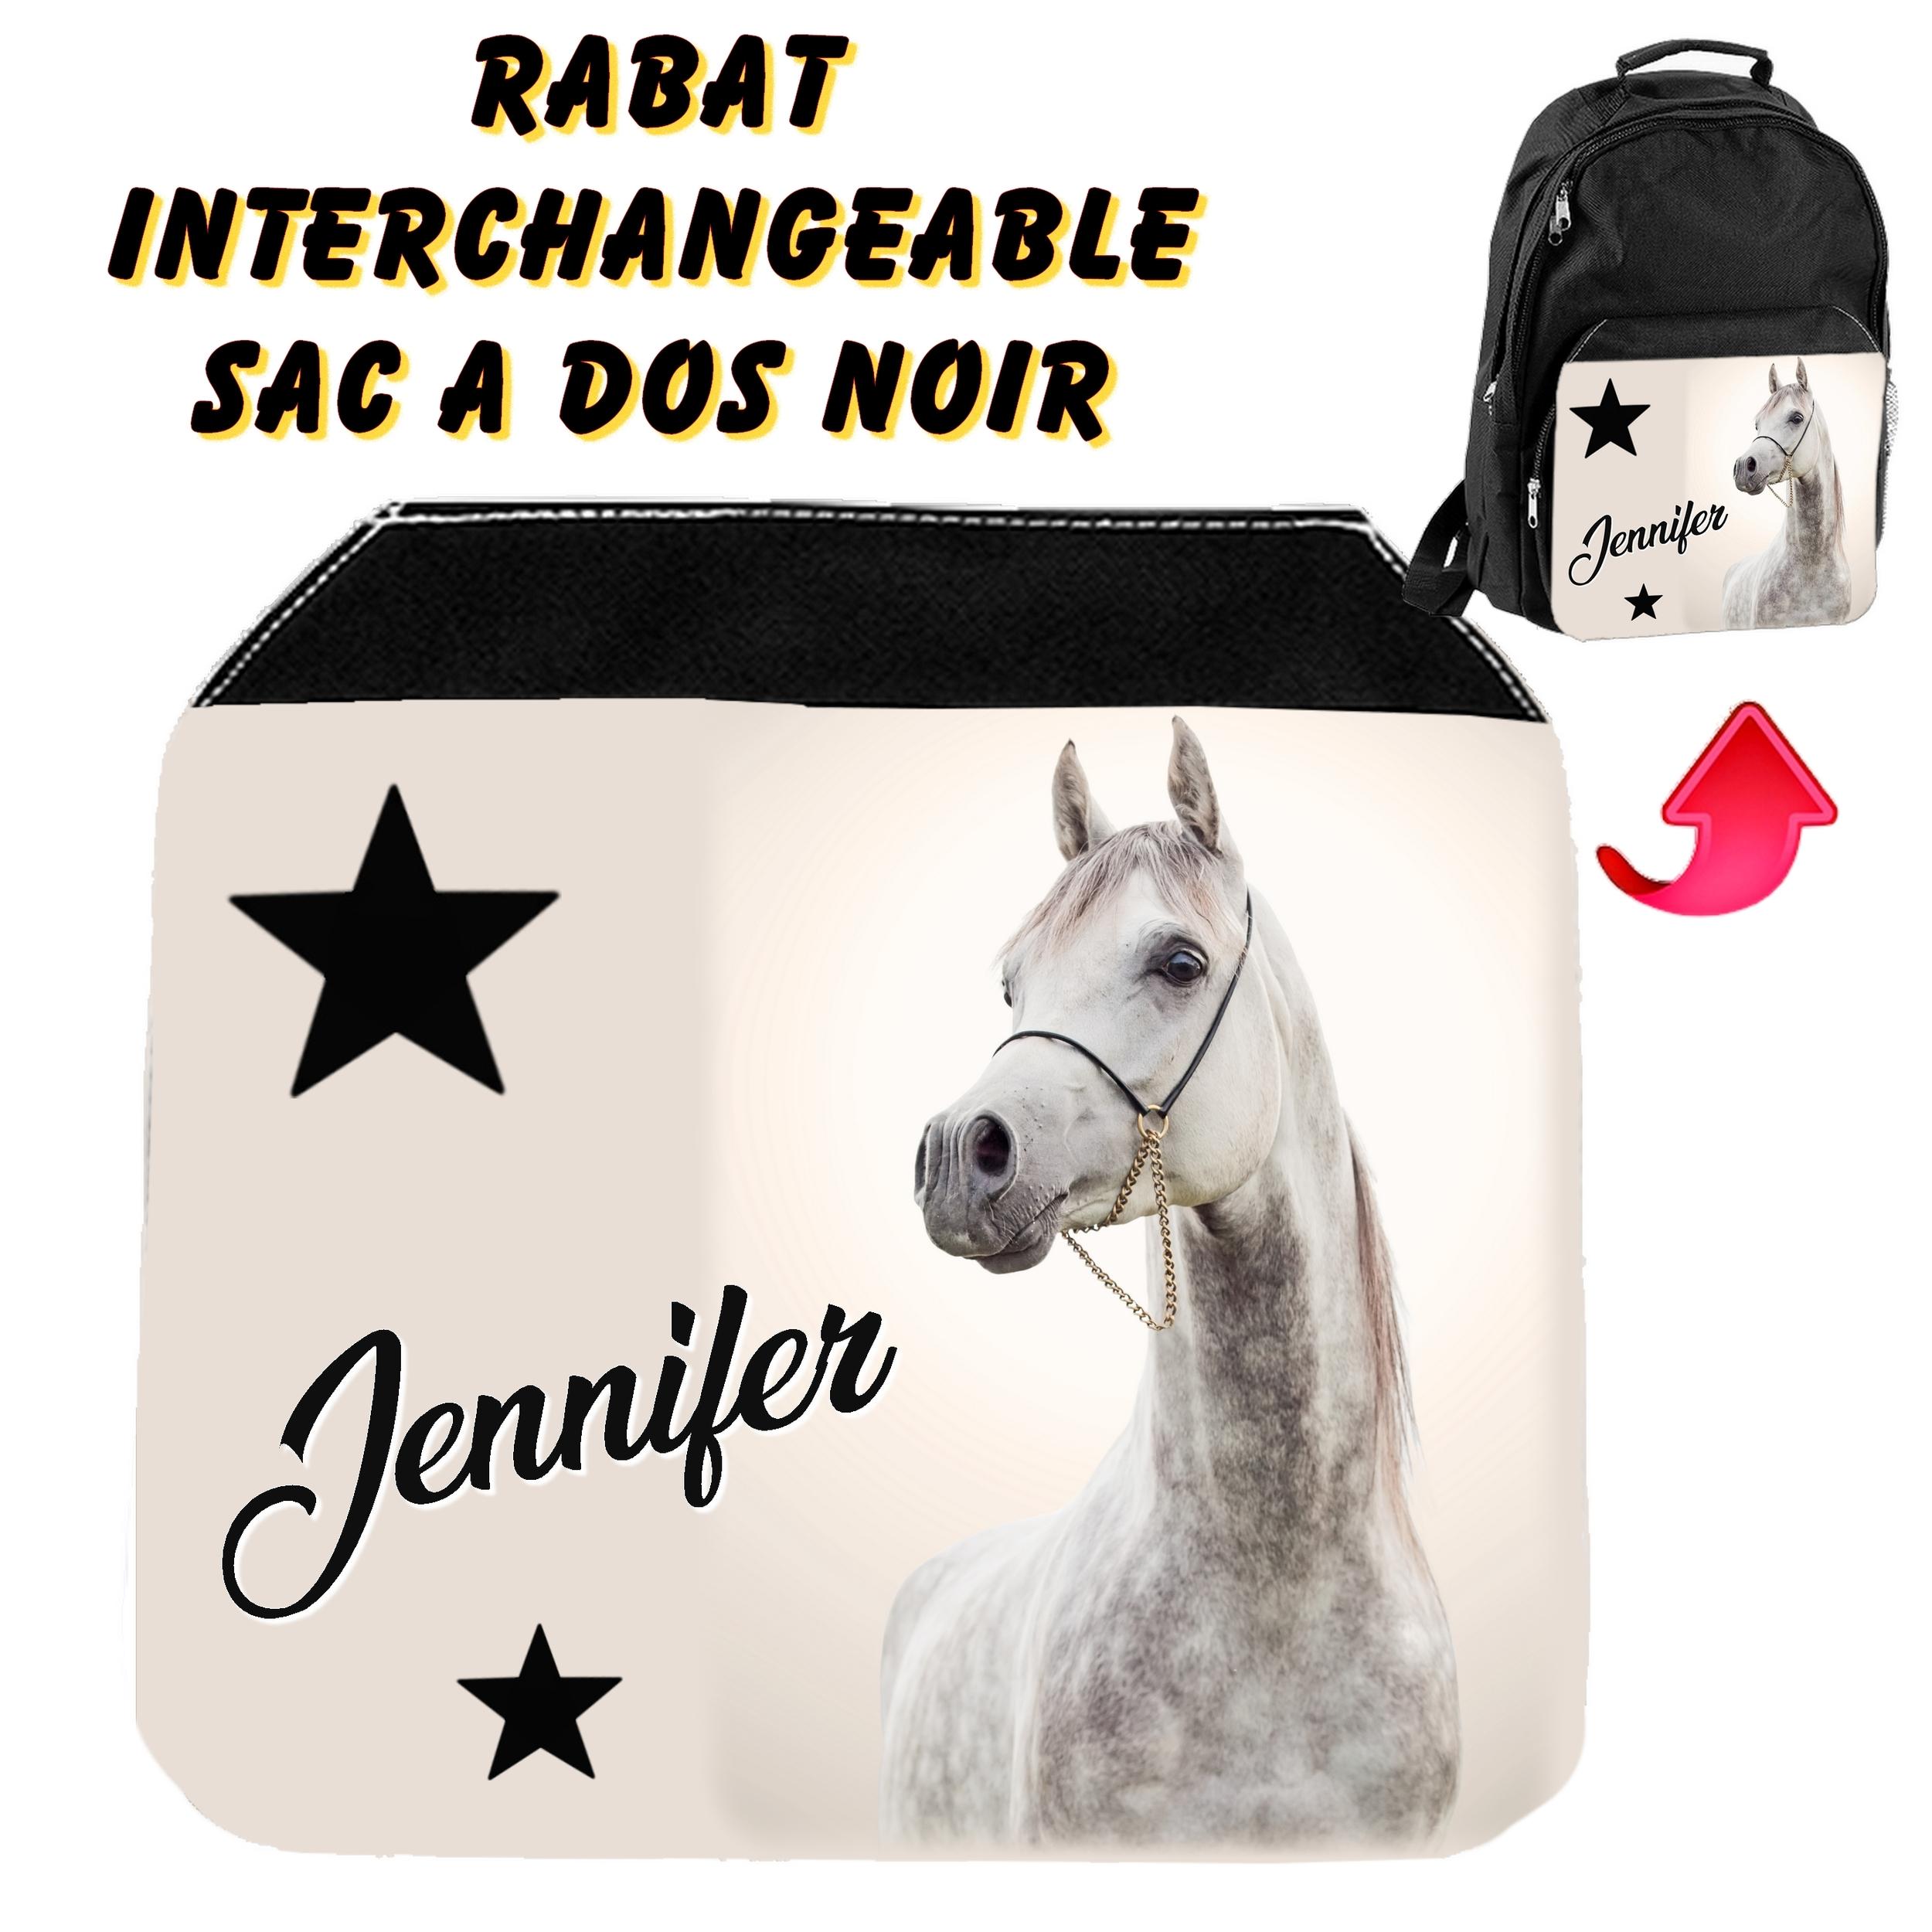 Sac de sport XXL Cheval Equitation personnalisé avec prénom